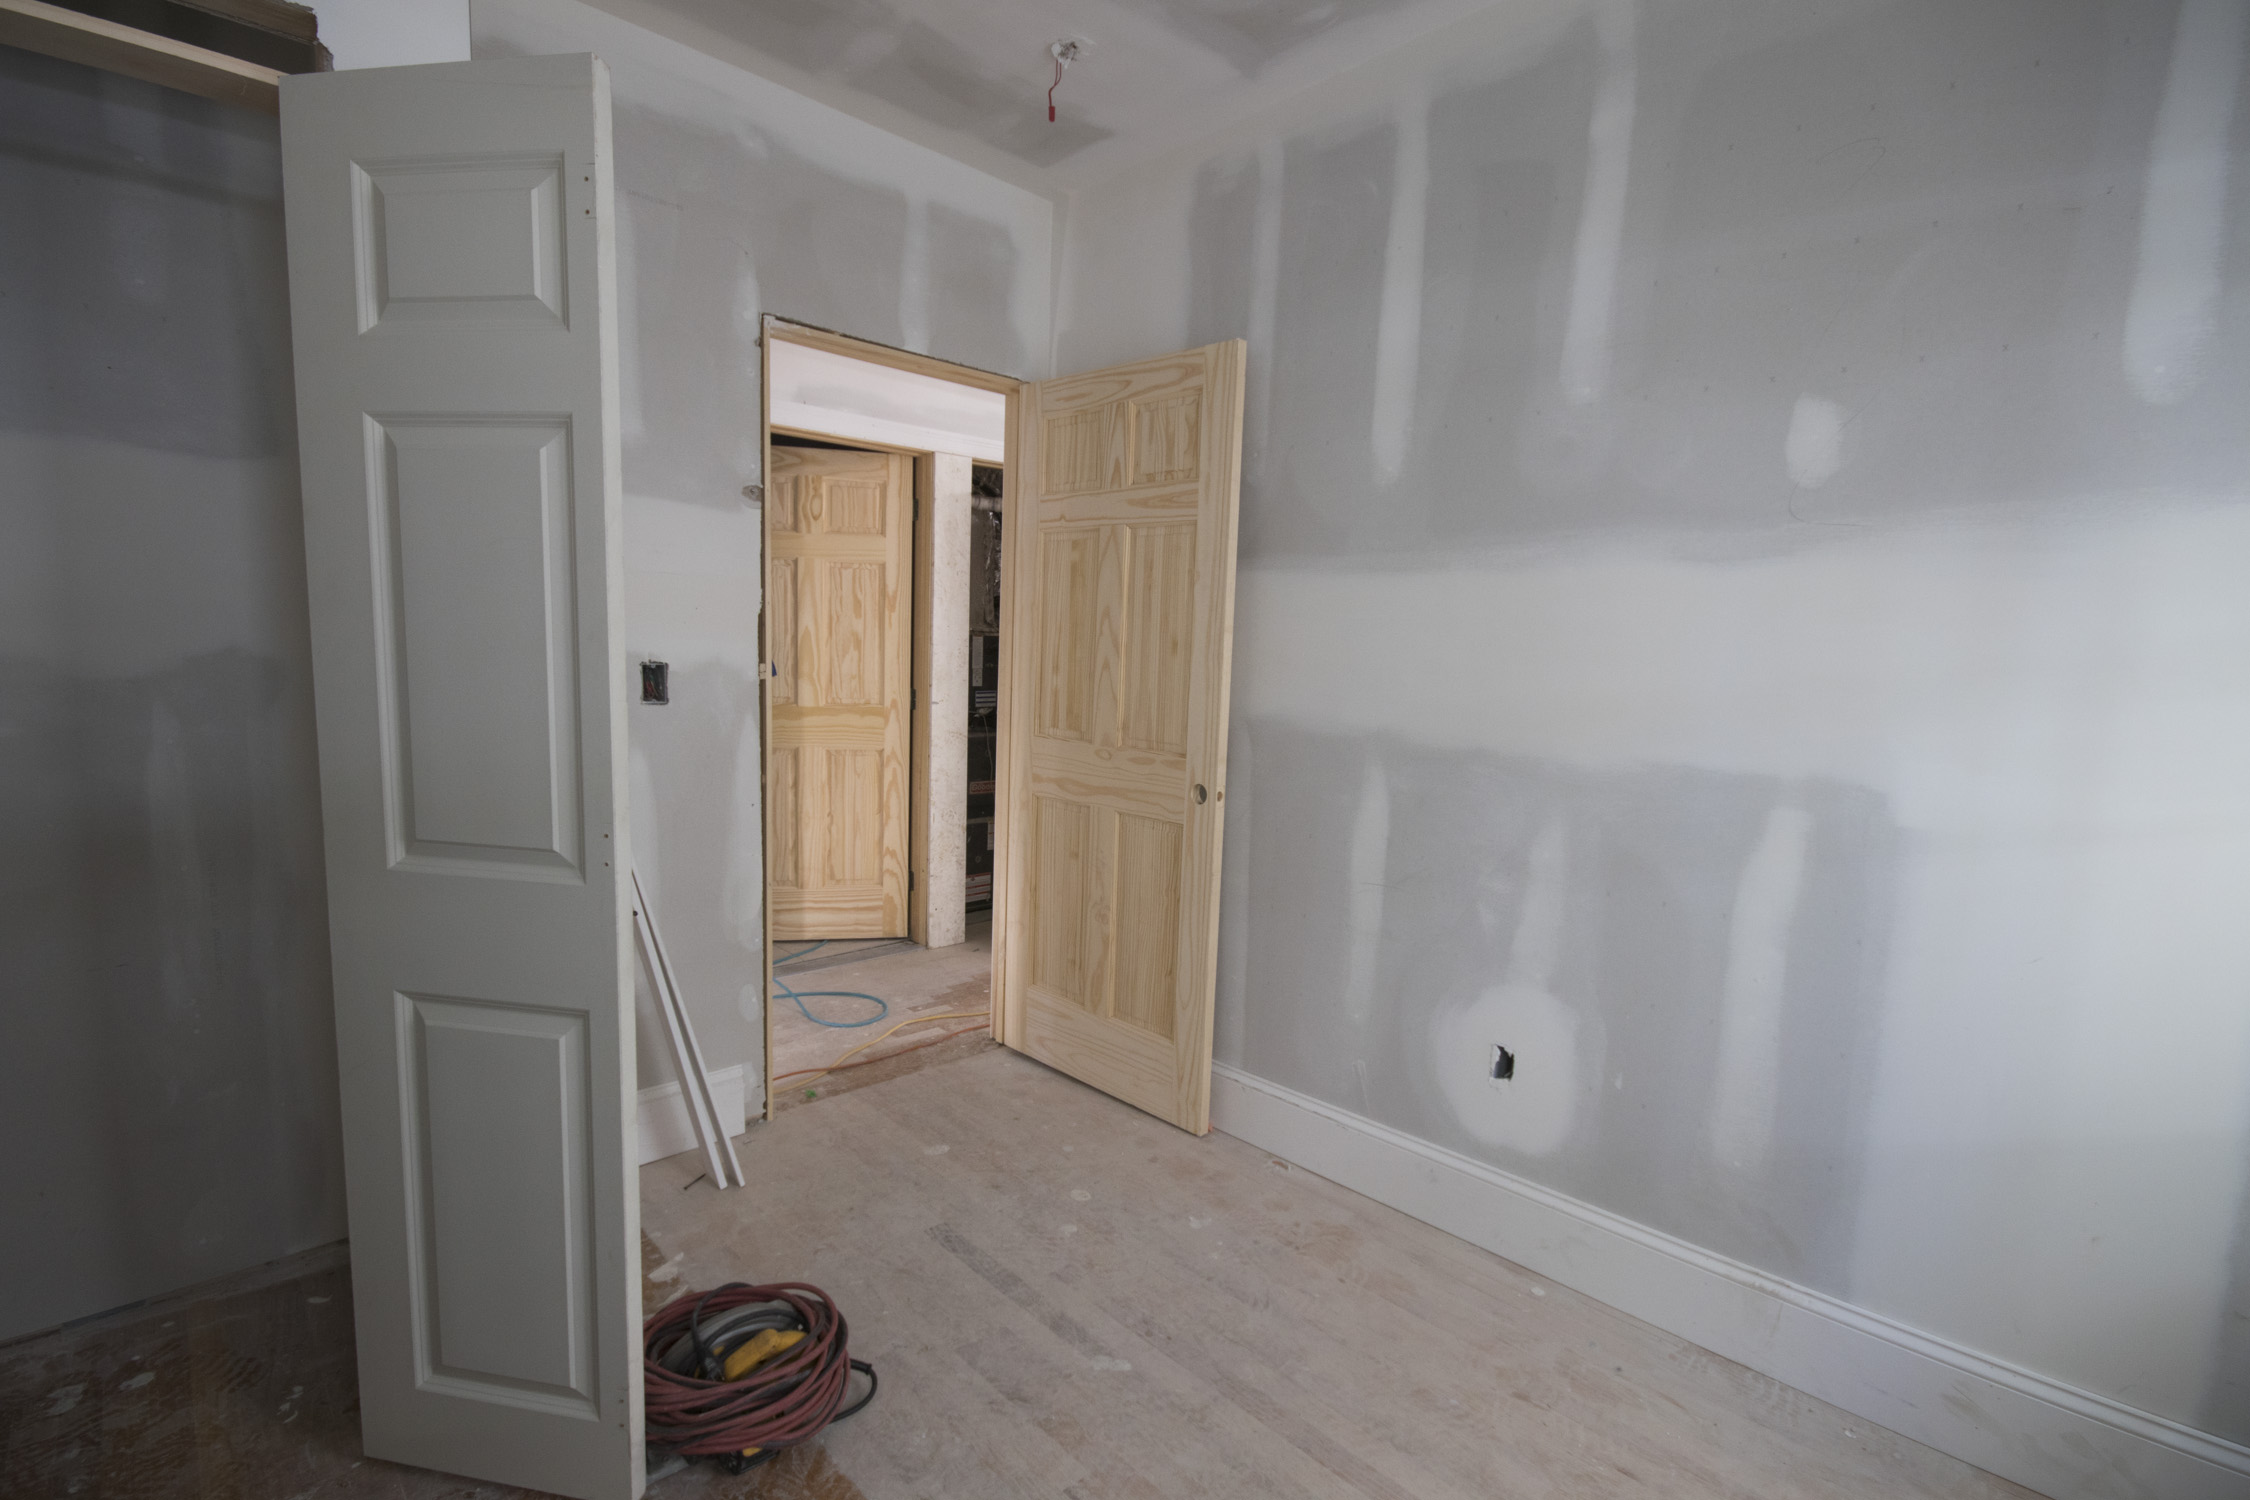 P. Northeast Contractors 27 Darling Street Boston Condo Renovation_209